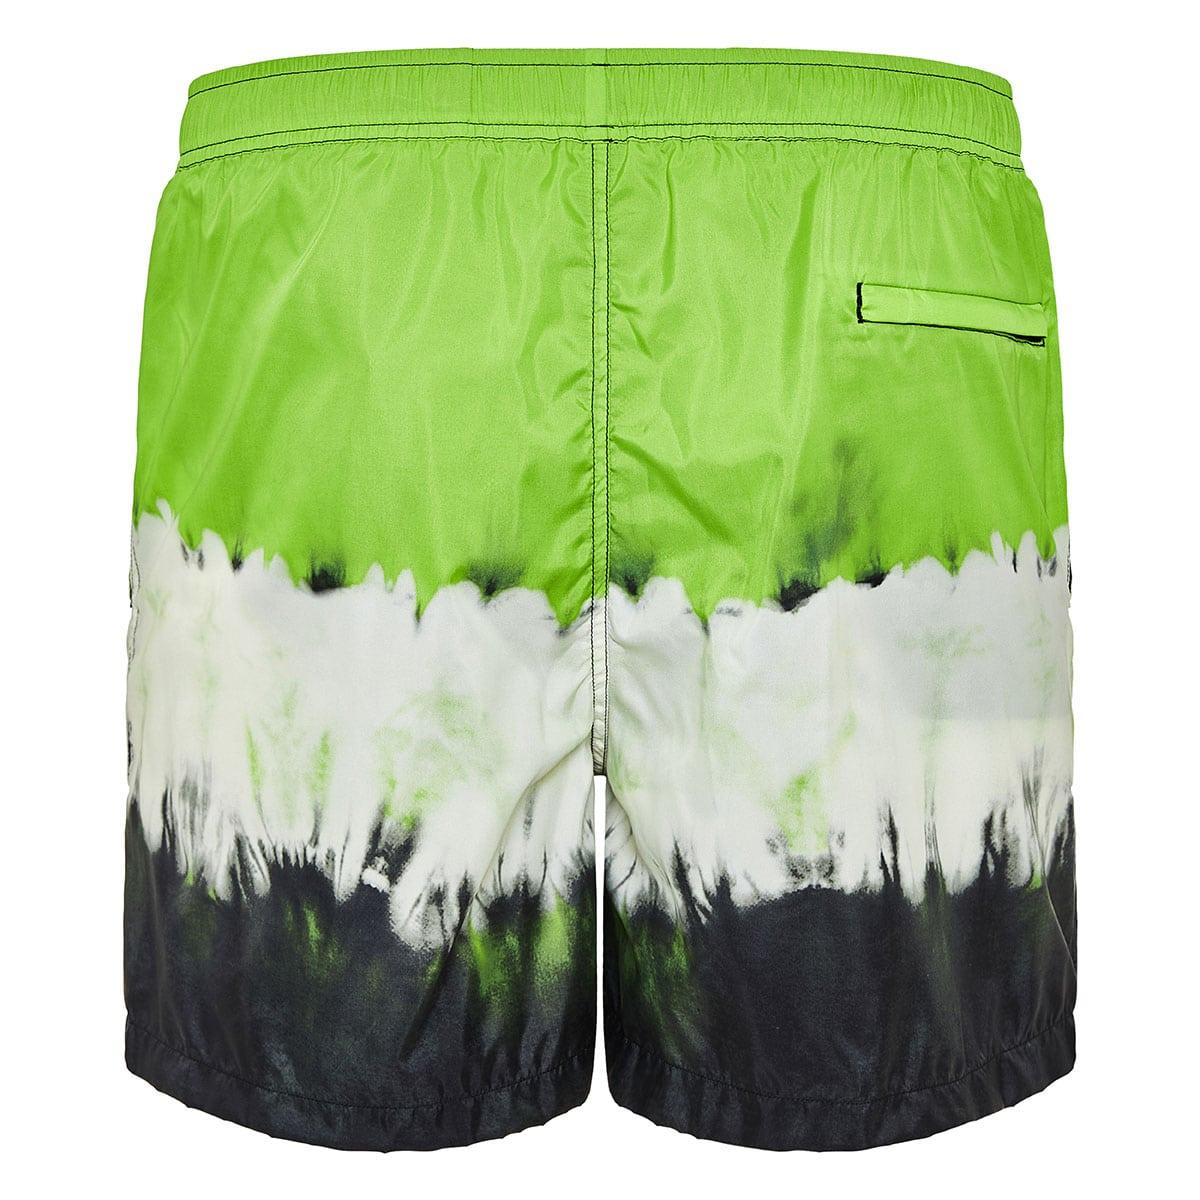 Jelly Block tie-dye swim shorts